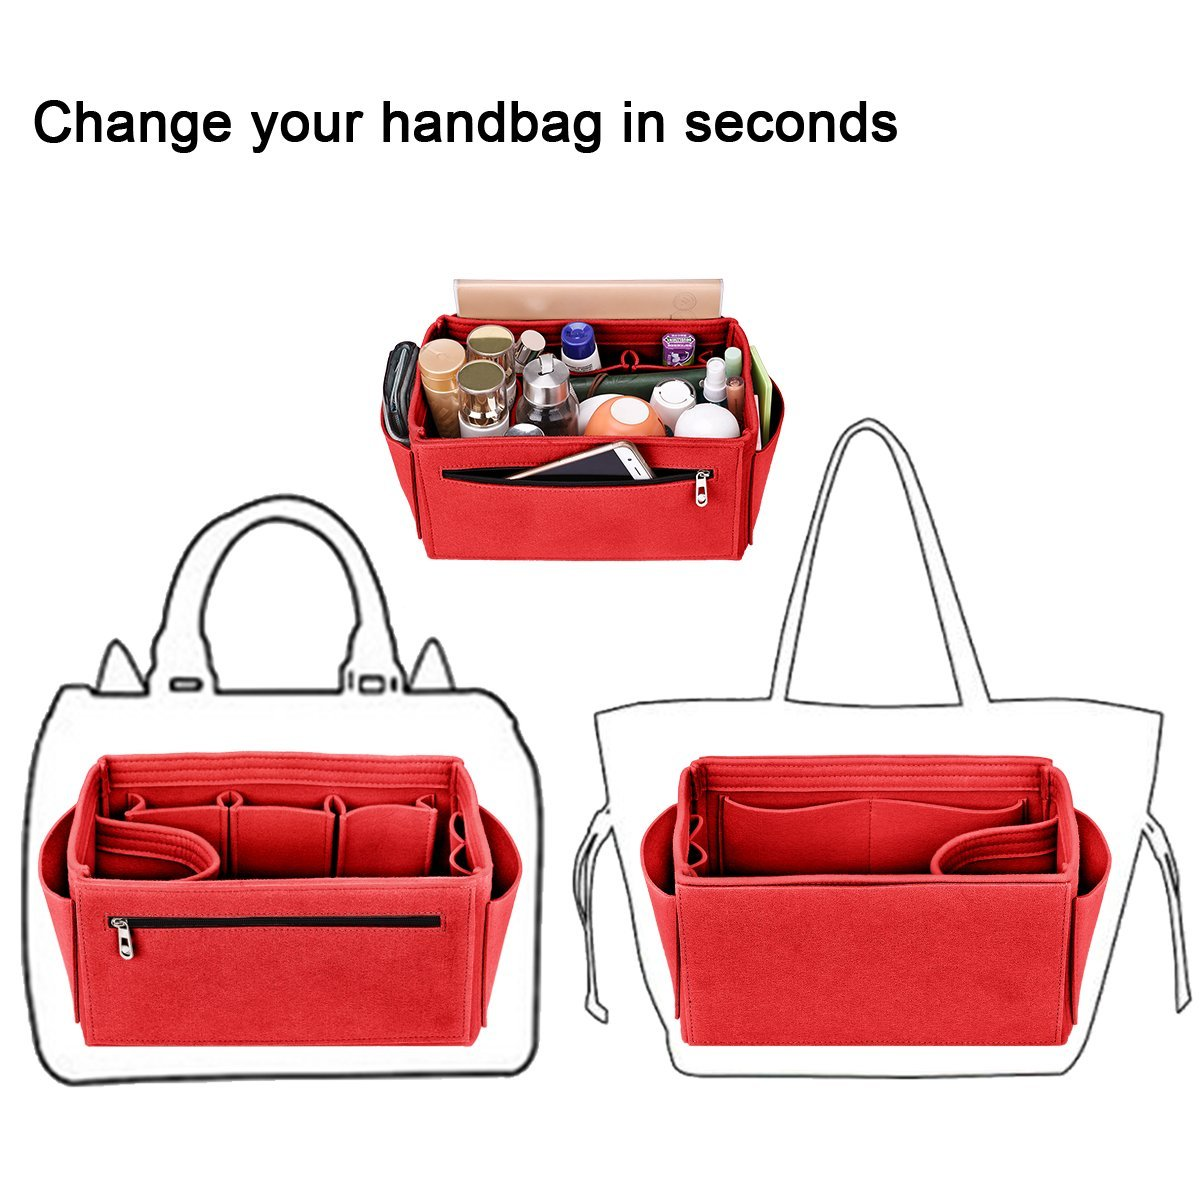 Medium, Black 4 Sizes Fit LV Speedy 25-40 Neverfull Felt Insert Purse Organizer Diaper Bag Organizer 5 Colors Handbag Organizer Bag in Bag